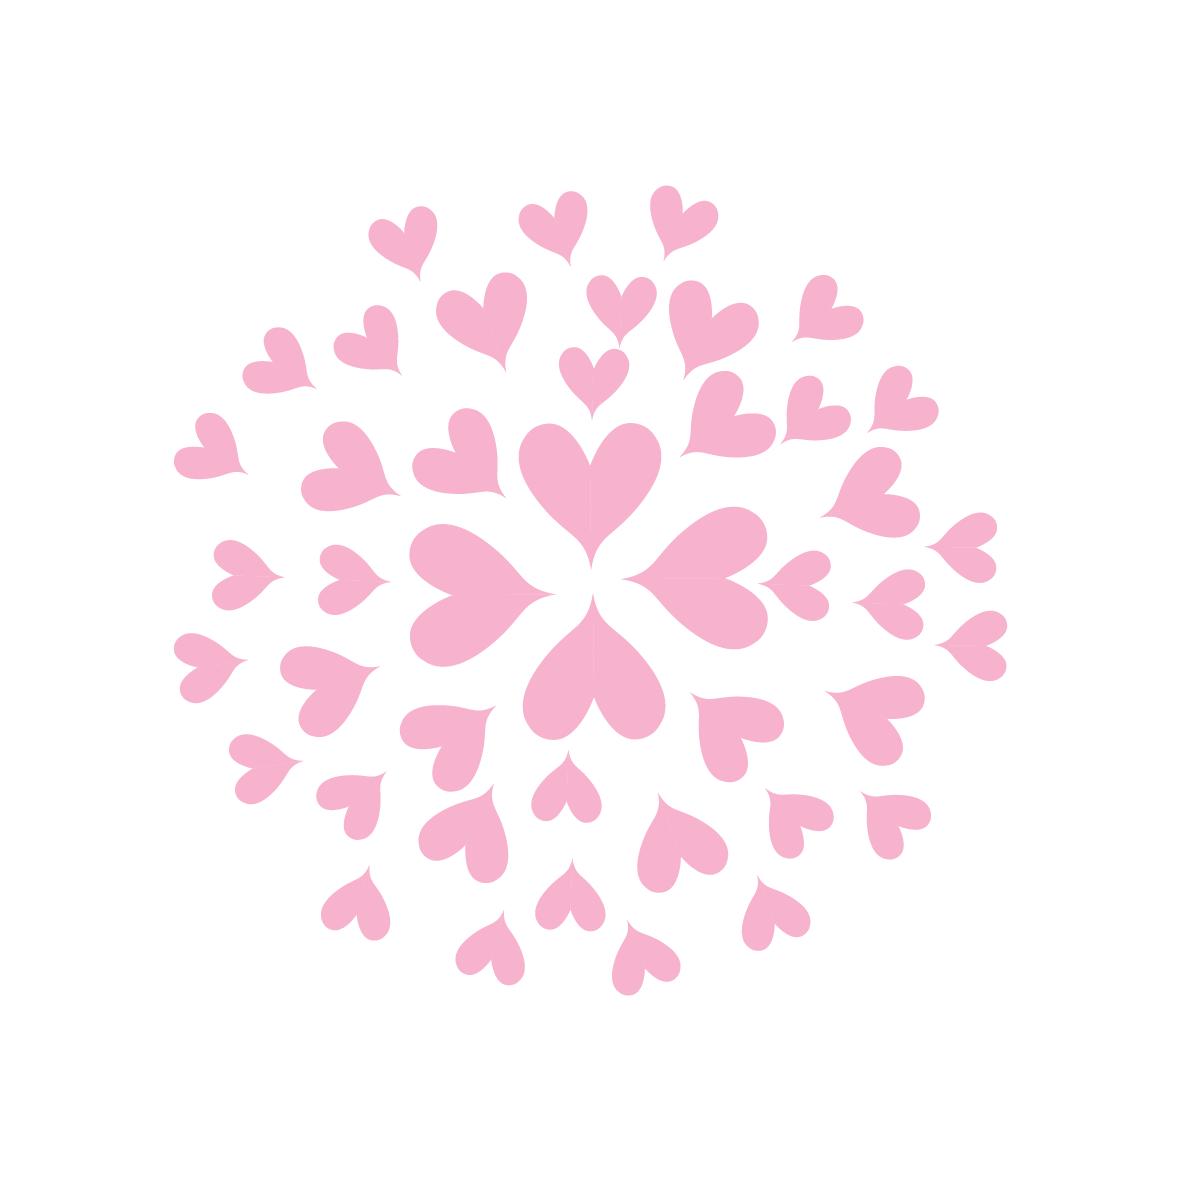 Fashionable Monotone Script Logo for New Wedding Blog